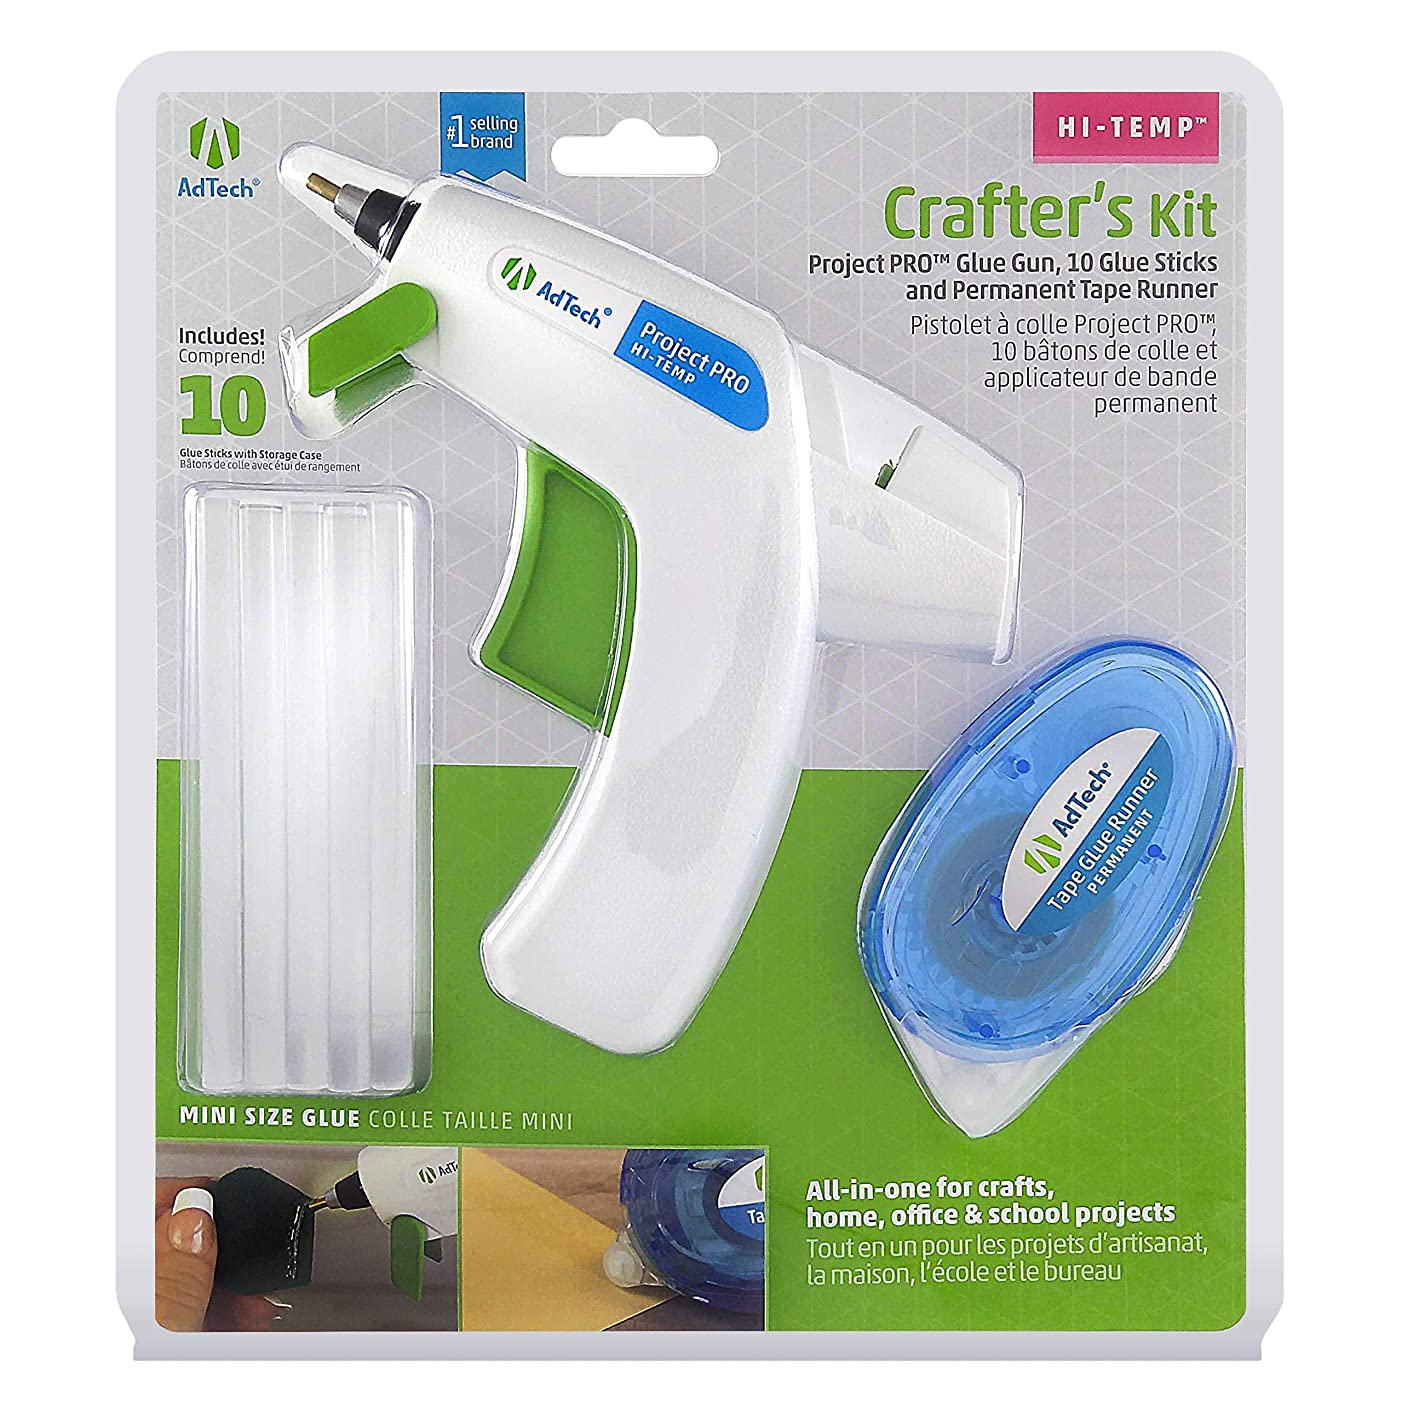 AdTech W05643 Crafter's Gift Pack with Detailer Glue Gun, Clear Glue Sticks and Glue Runner